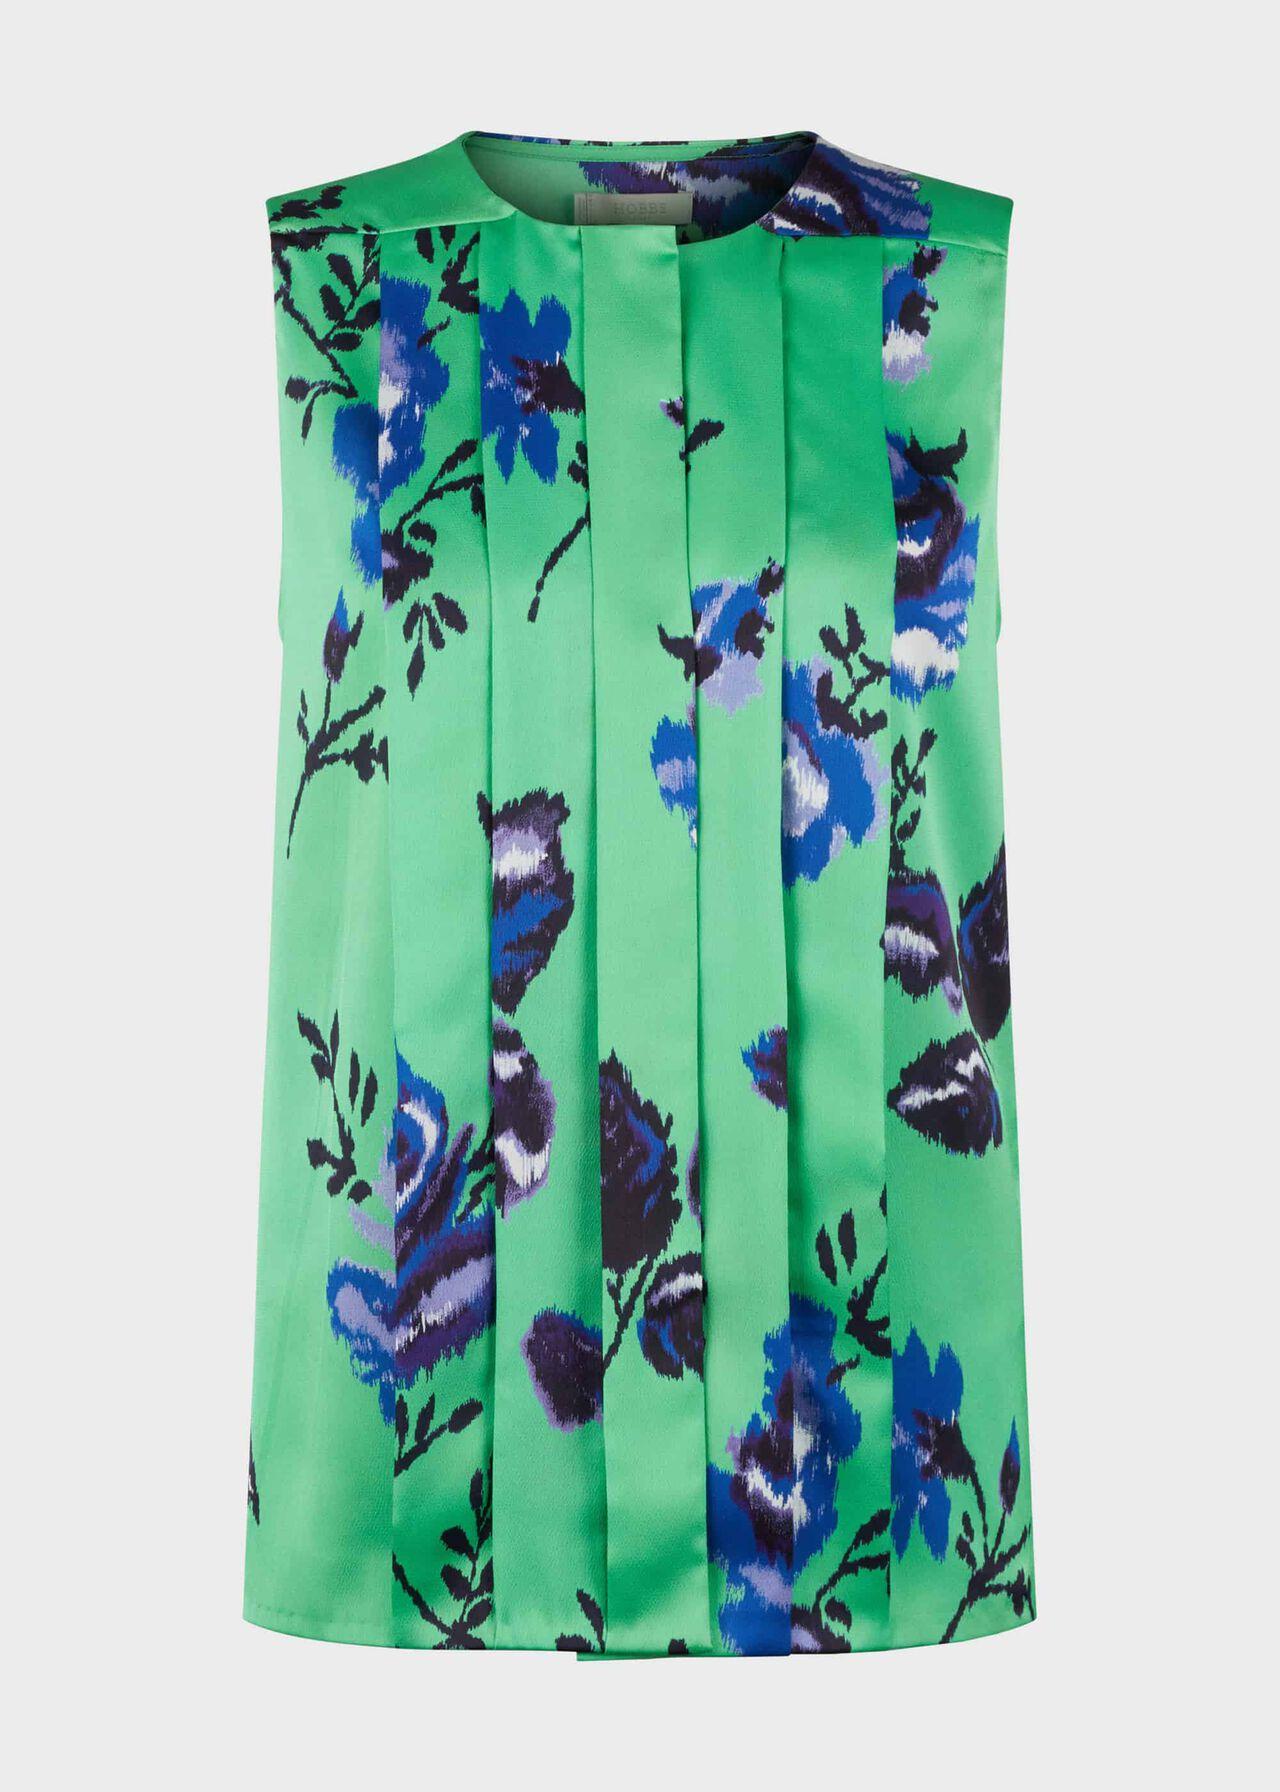 Miriam Floral Blouse Green Blue